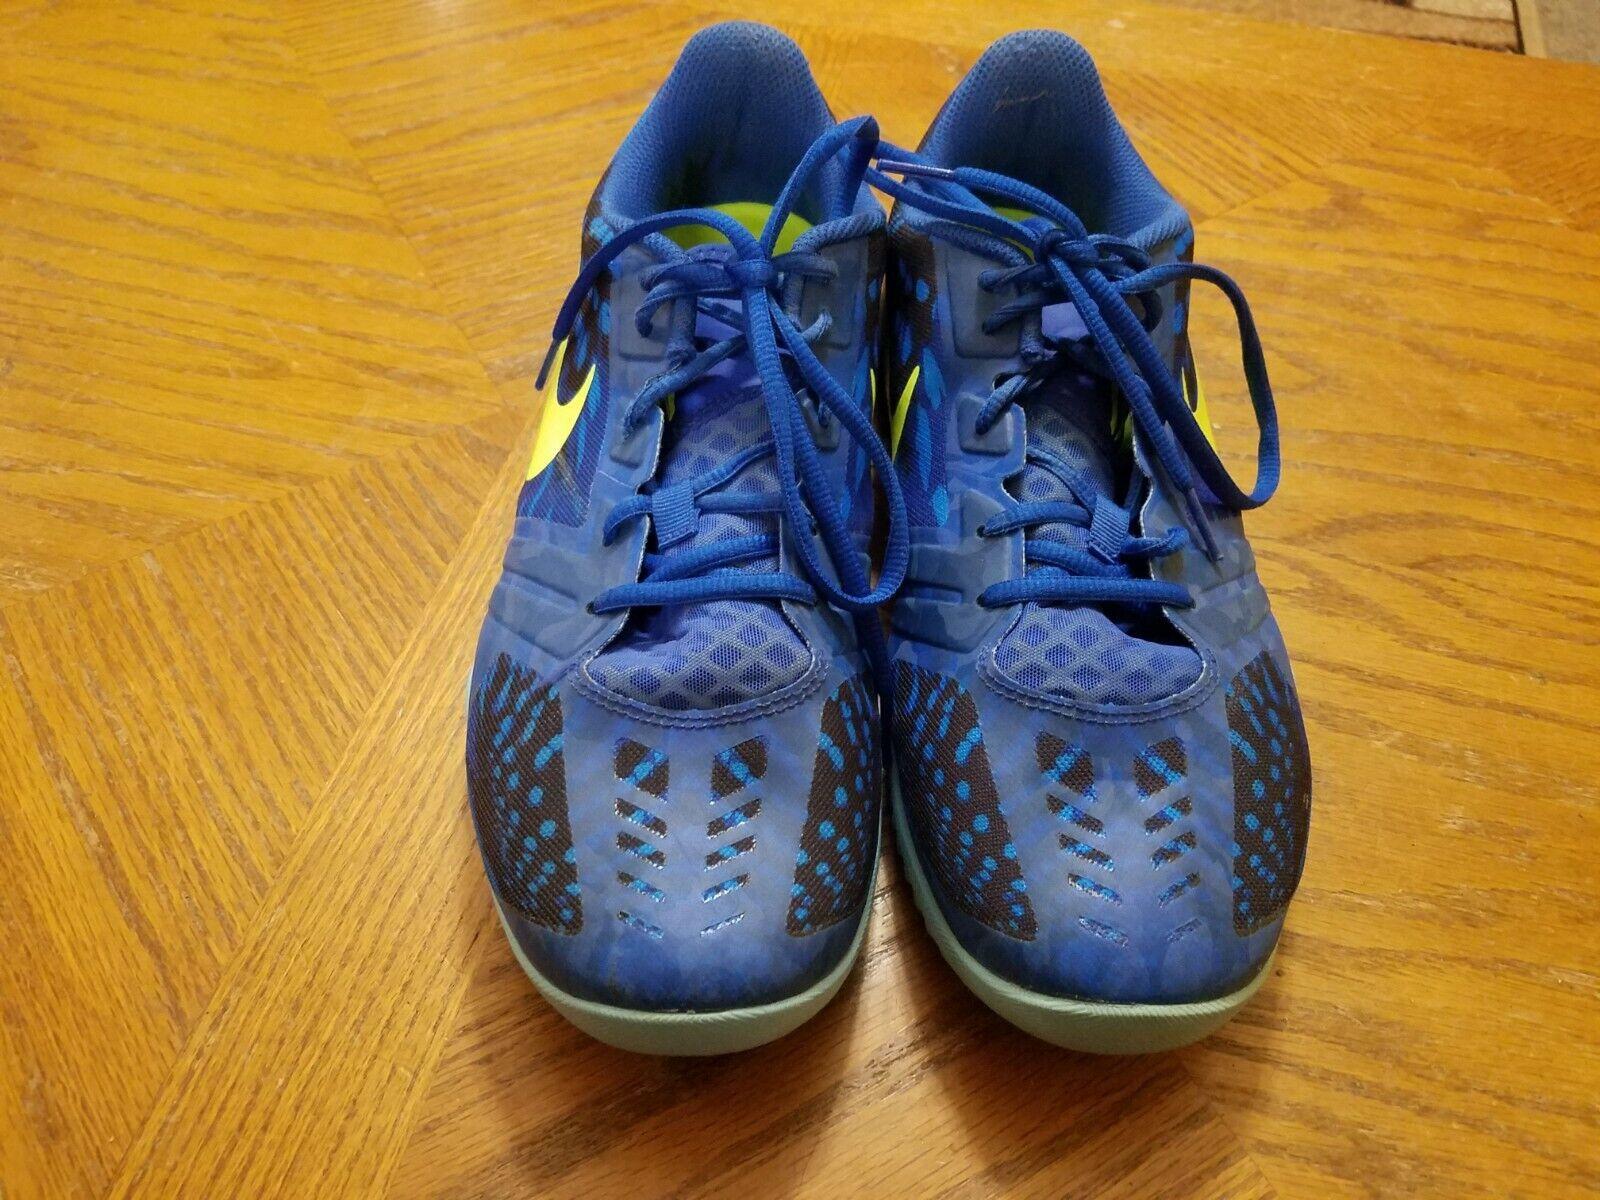 Nike KB Mentality Men's Sneakers 704942-401 Royal bluee Volt Size 10.5 EUC